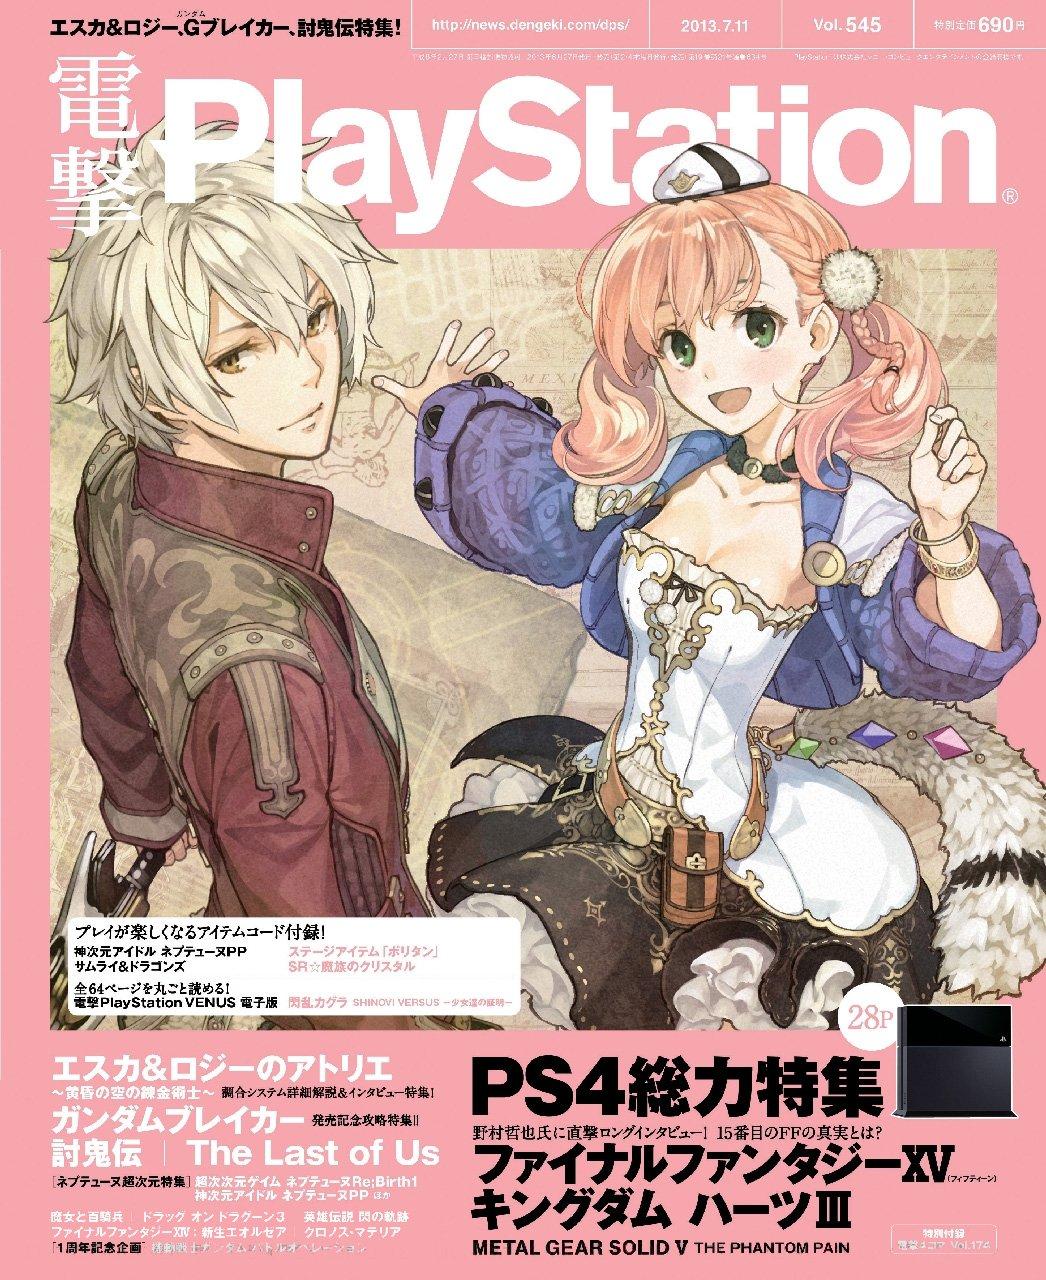 Dengeki PlayStation 545 (July 11, 2013)